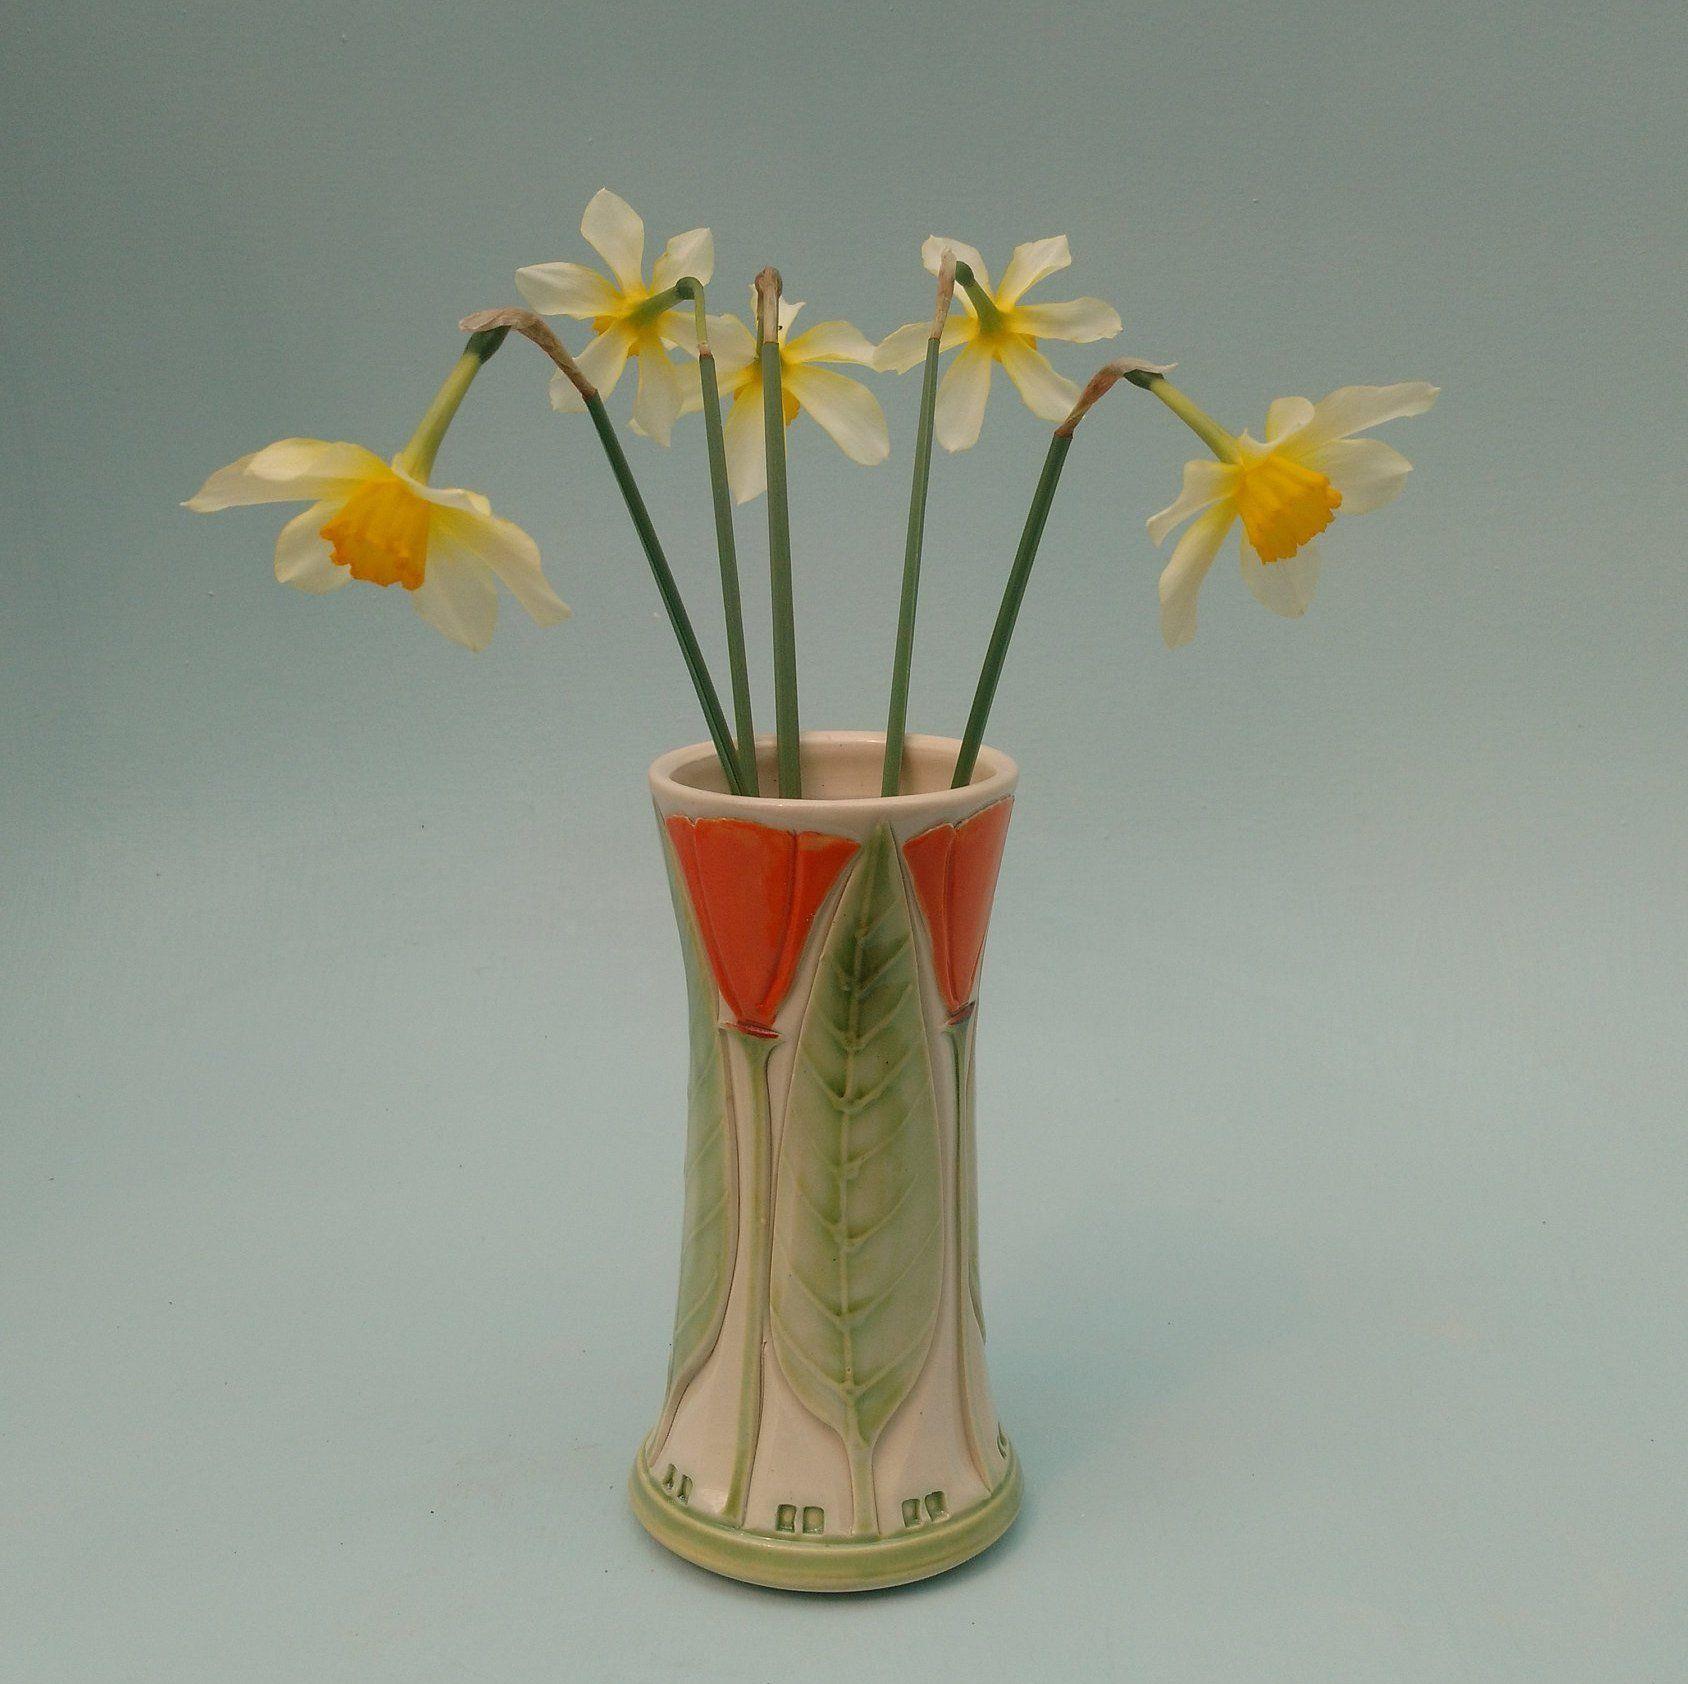 Art Nouveau Inspired California Poppy By Mason Larose: Arts And Craft Mission Style, Orange California Poppy Vase